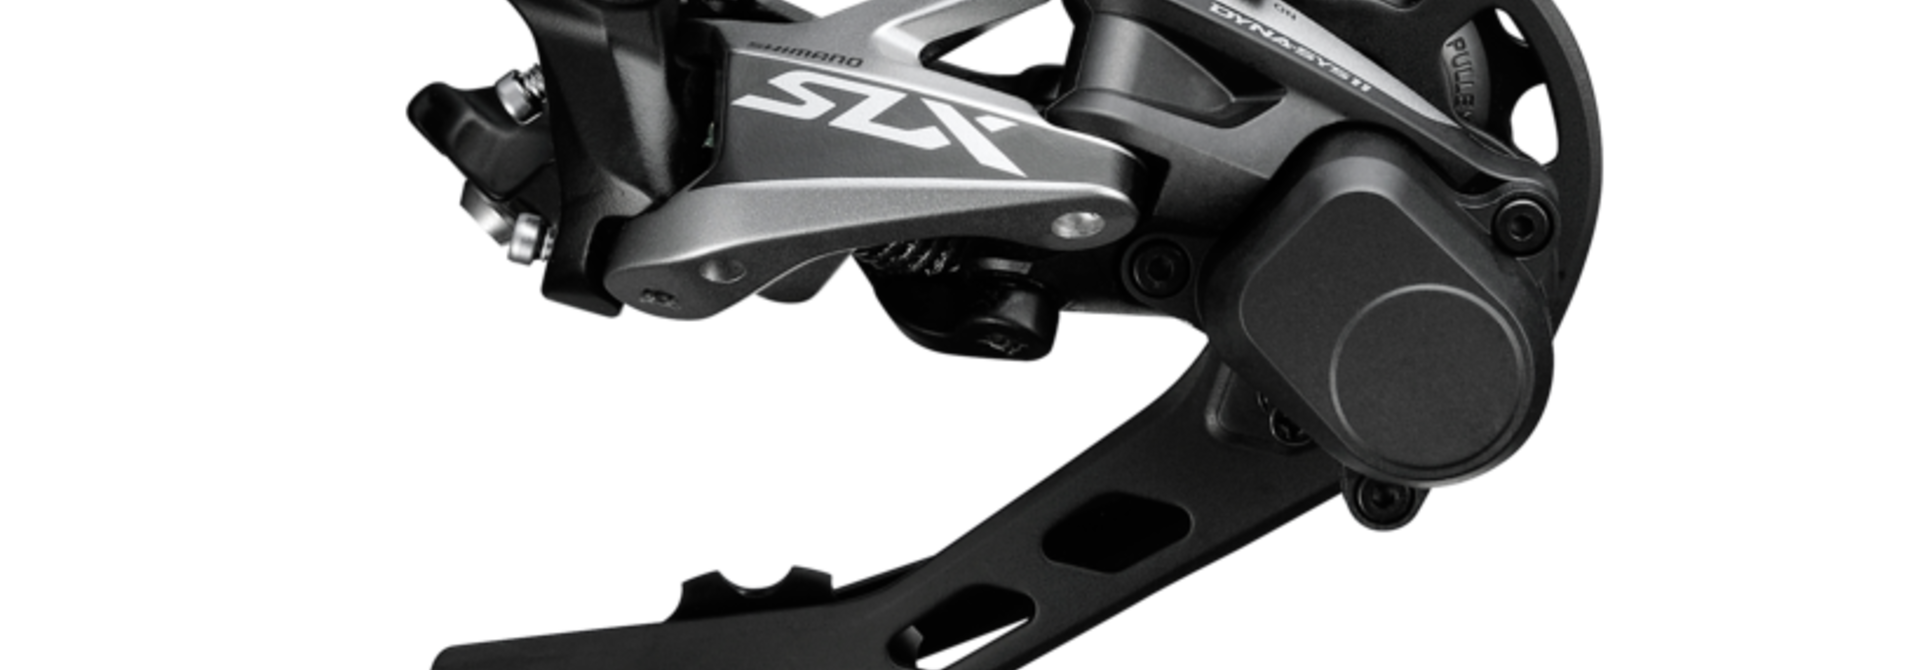 Shimano Rear Derailleur, RD-M7000, SLX, GS 11-Speed Top-Normal Shadow Plus Design, Direct Attachment (Direct Mount Compatible)